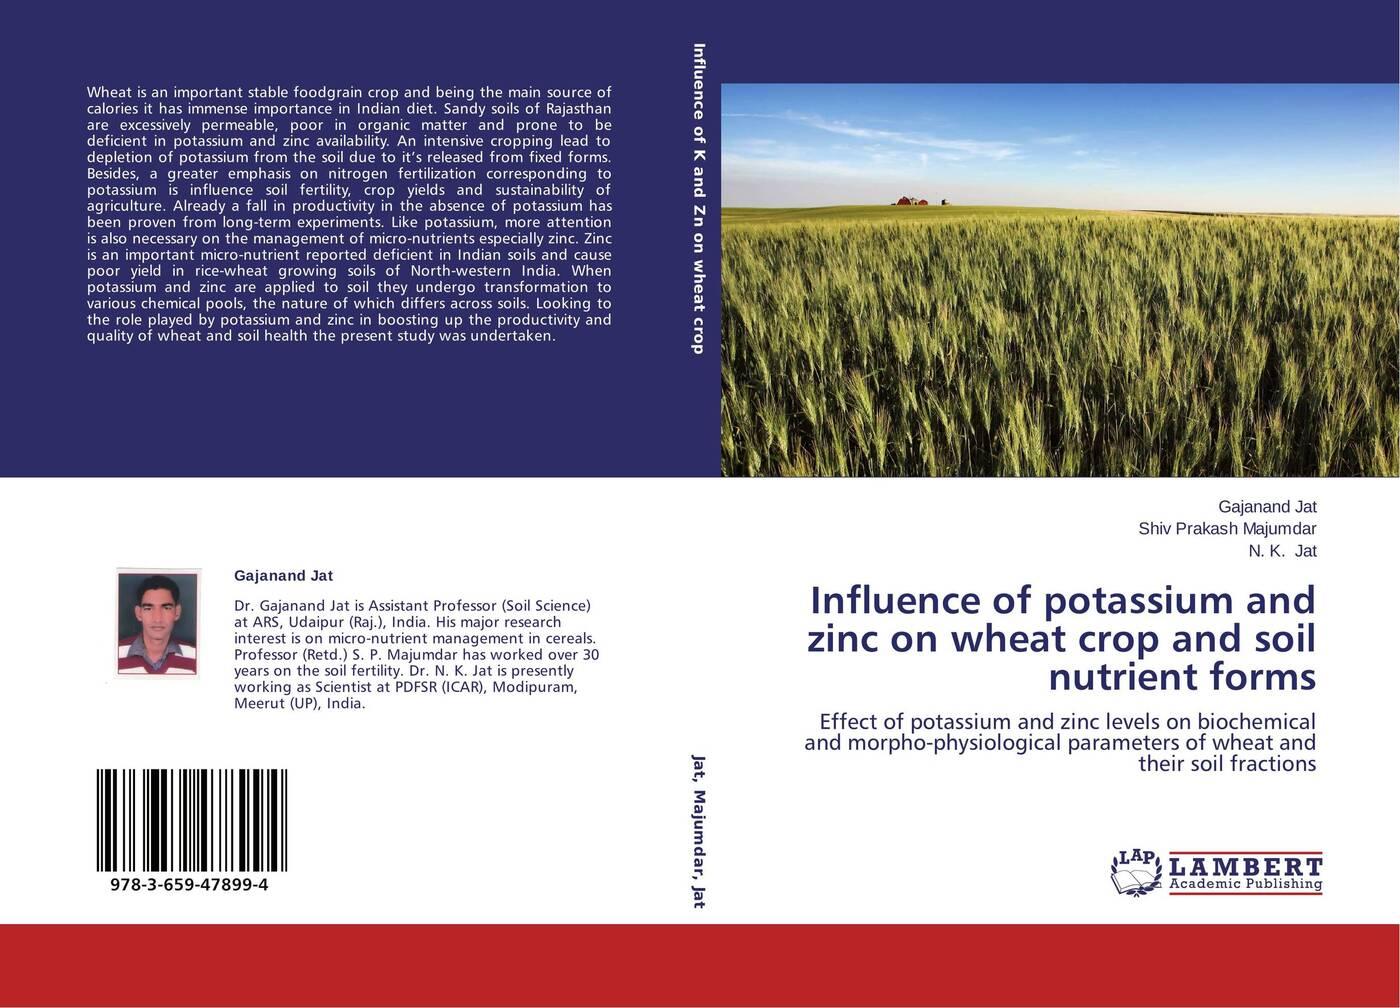 Gajanand Jat,Shiv Prakash Majumdar and N. K. Jat Influence of potassium and zinc on wheat crop and soil nutrient forms potassium nutrition in banana